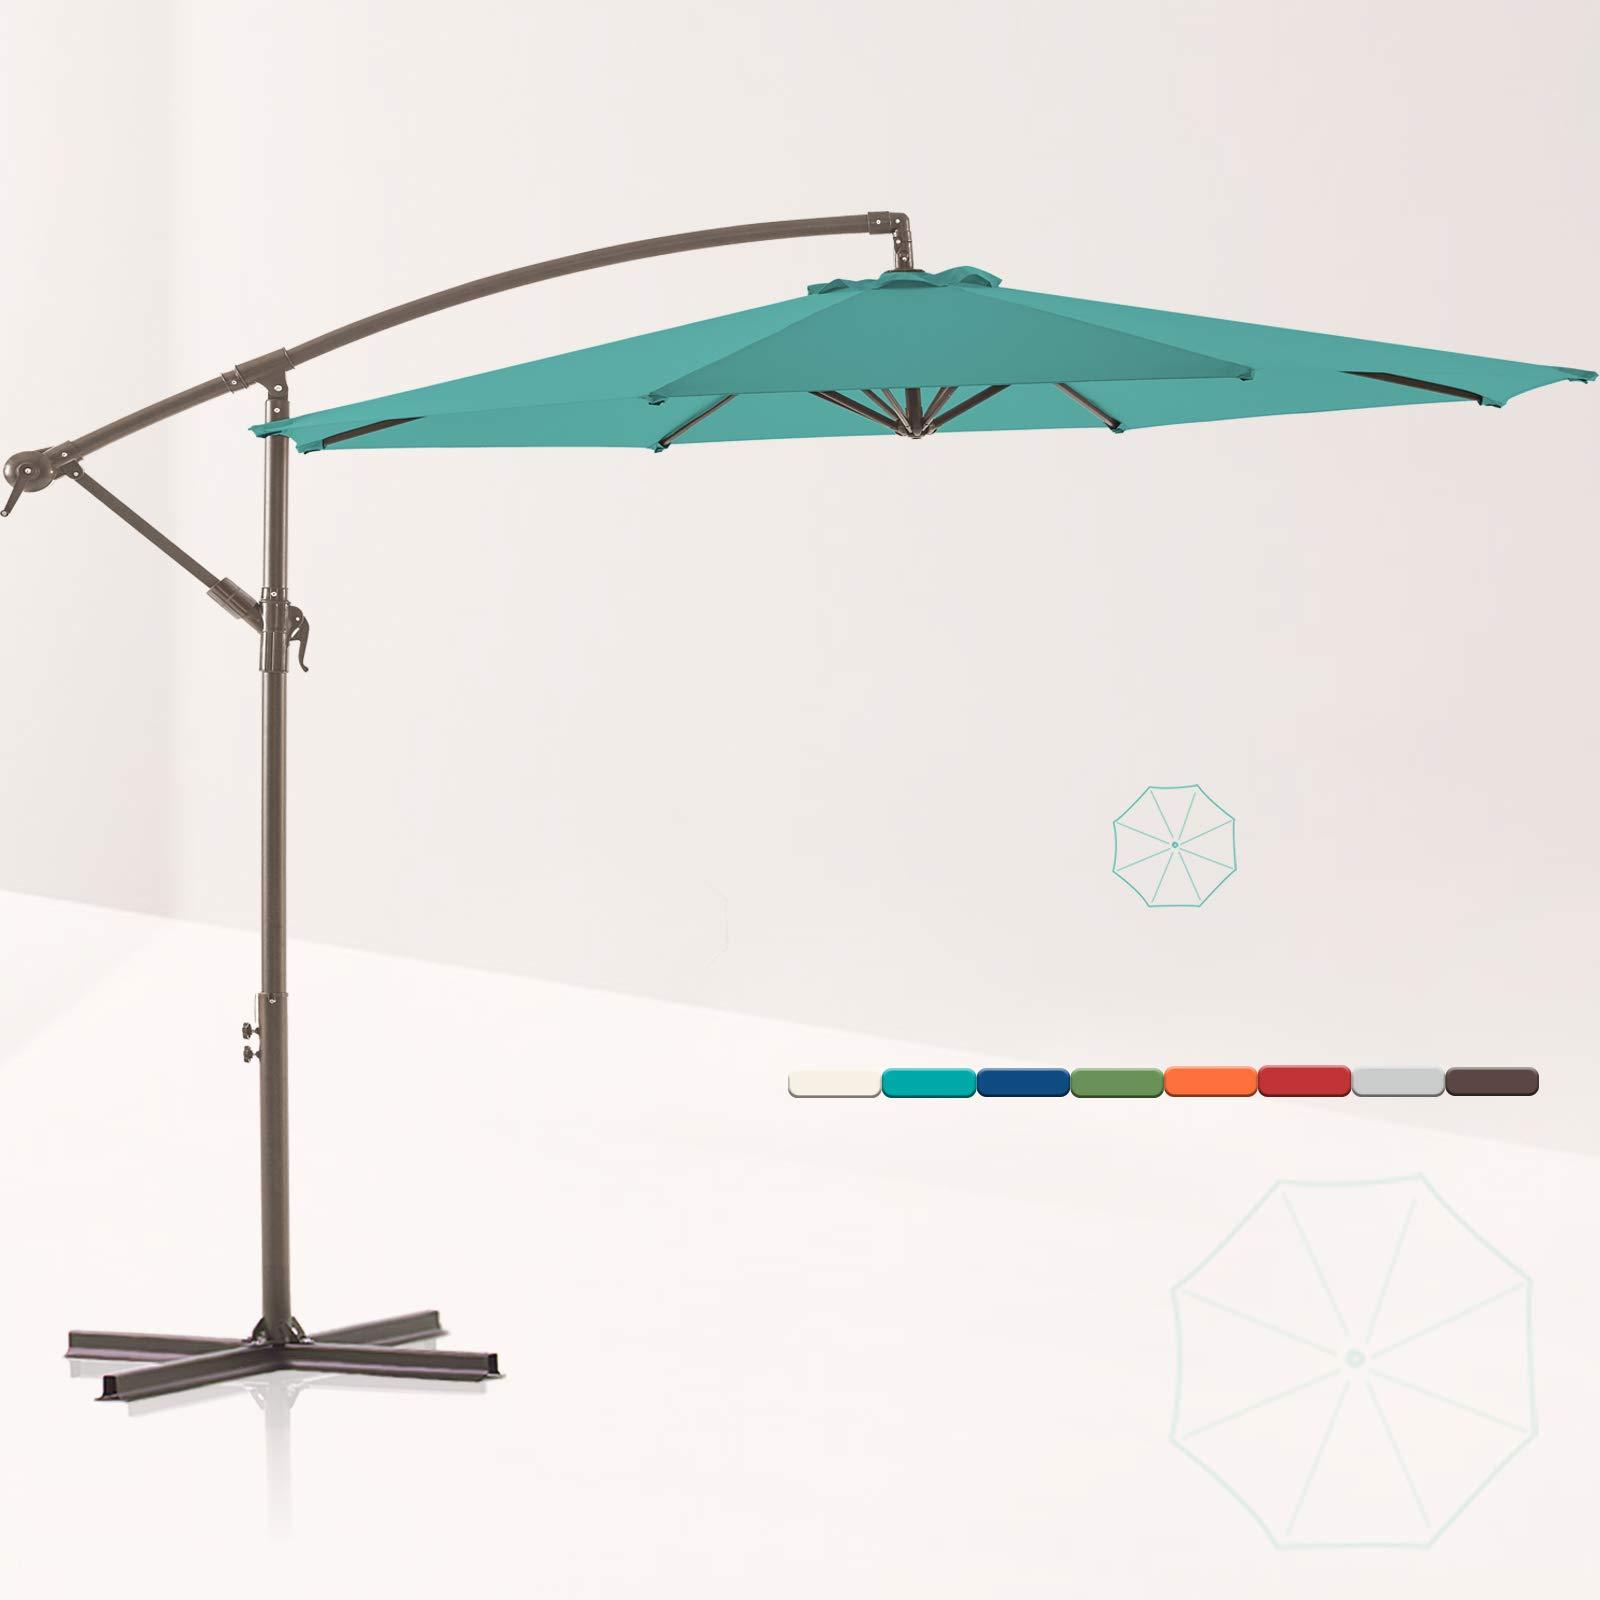 LE CONTE 10 ft. Offset Hanging Patio Umbrella Cantilever Outdoor Umbrellas with Fade Resistant Solution-Dyed Canopy, Infinite Tilt, Crank & Cross Base (Aruba Blue)